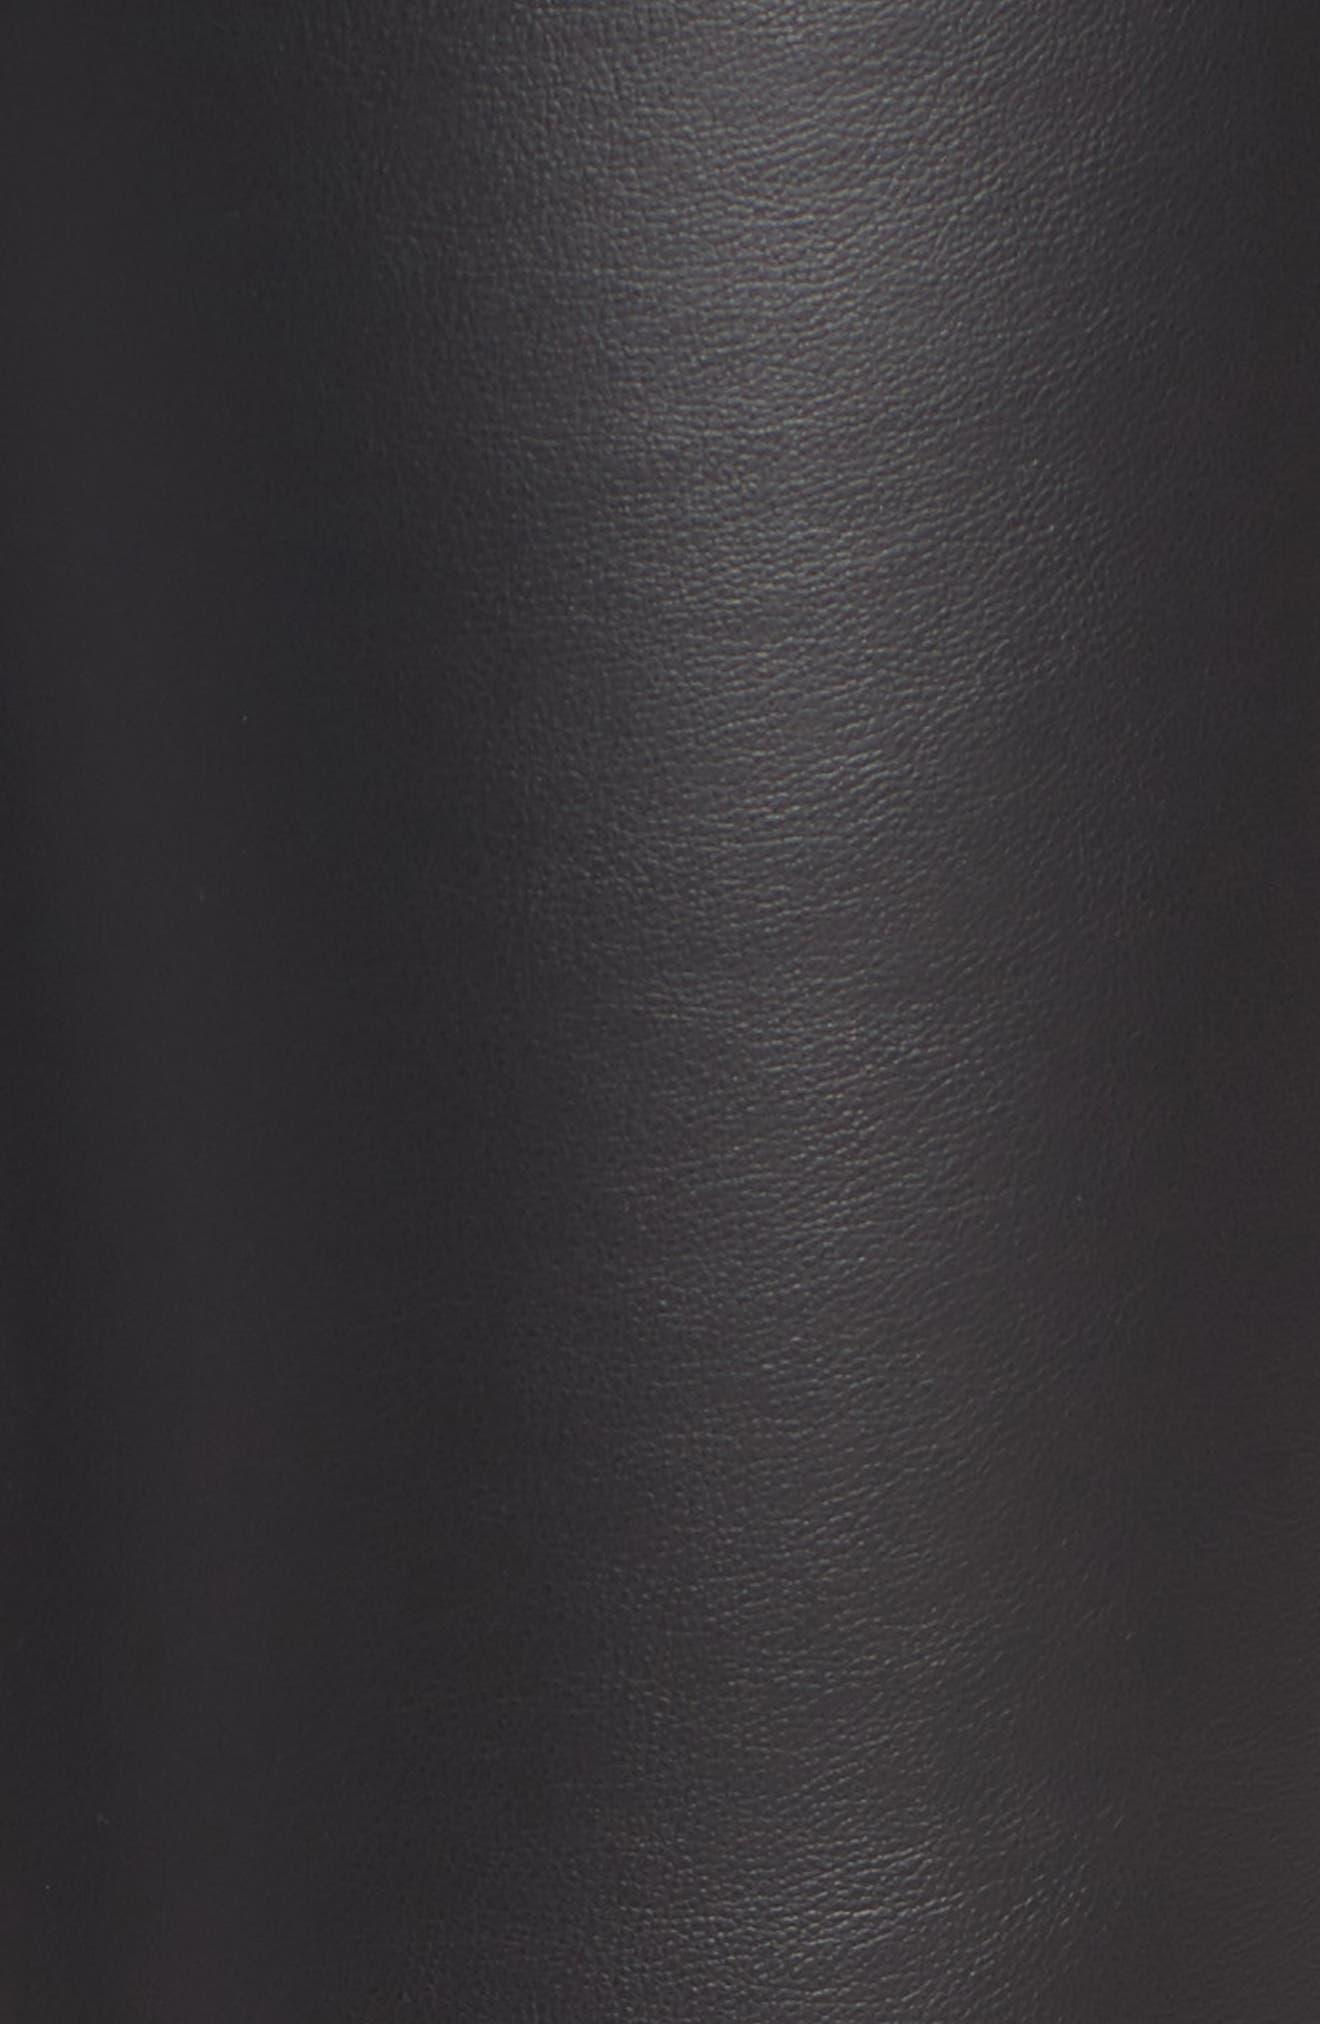 Bryce High Waist Faux Leather Leggings,                             Alternate thumbnail 6, color,                             Black